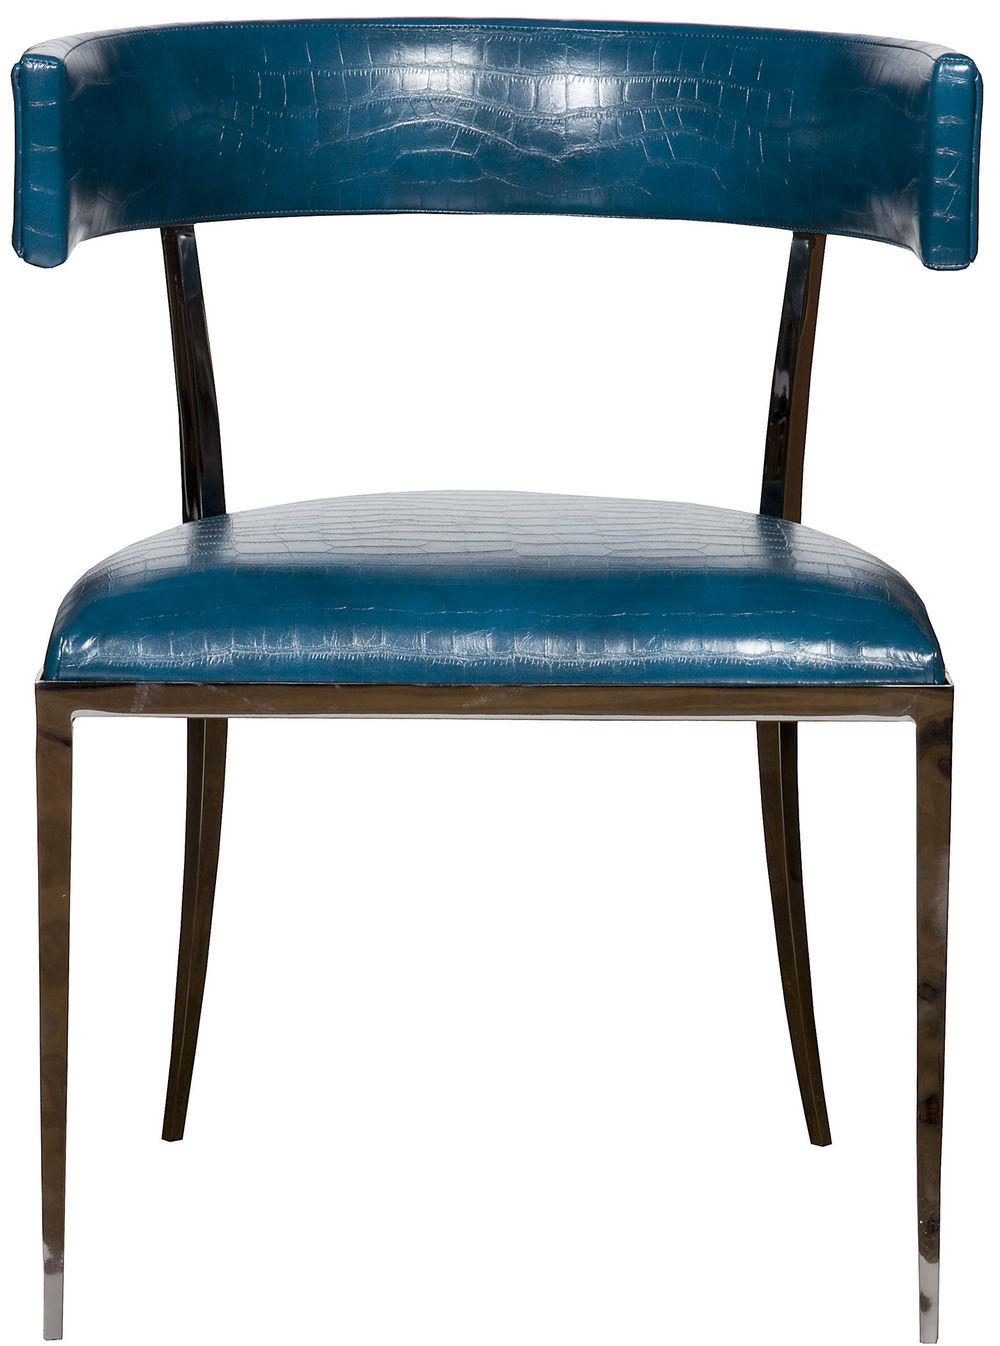 Vanguard Furniture - Greer Chair